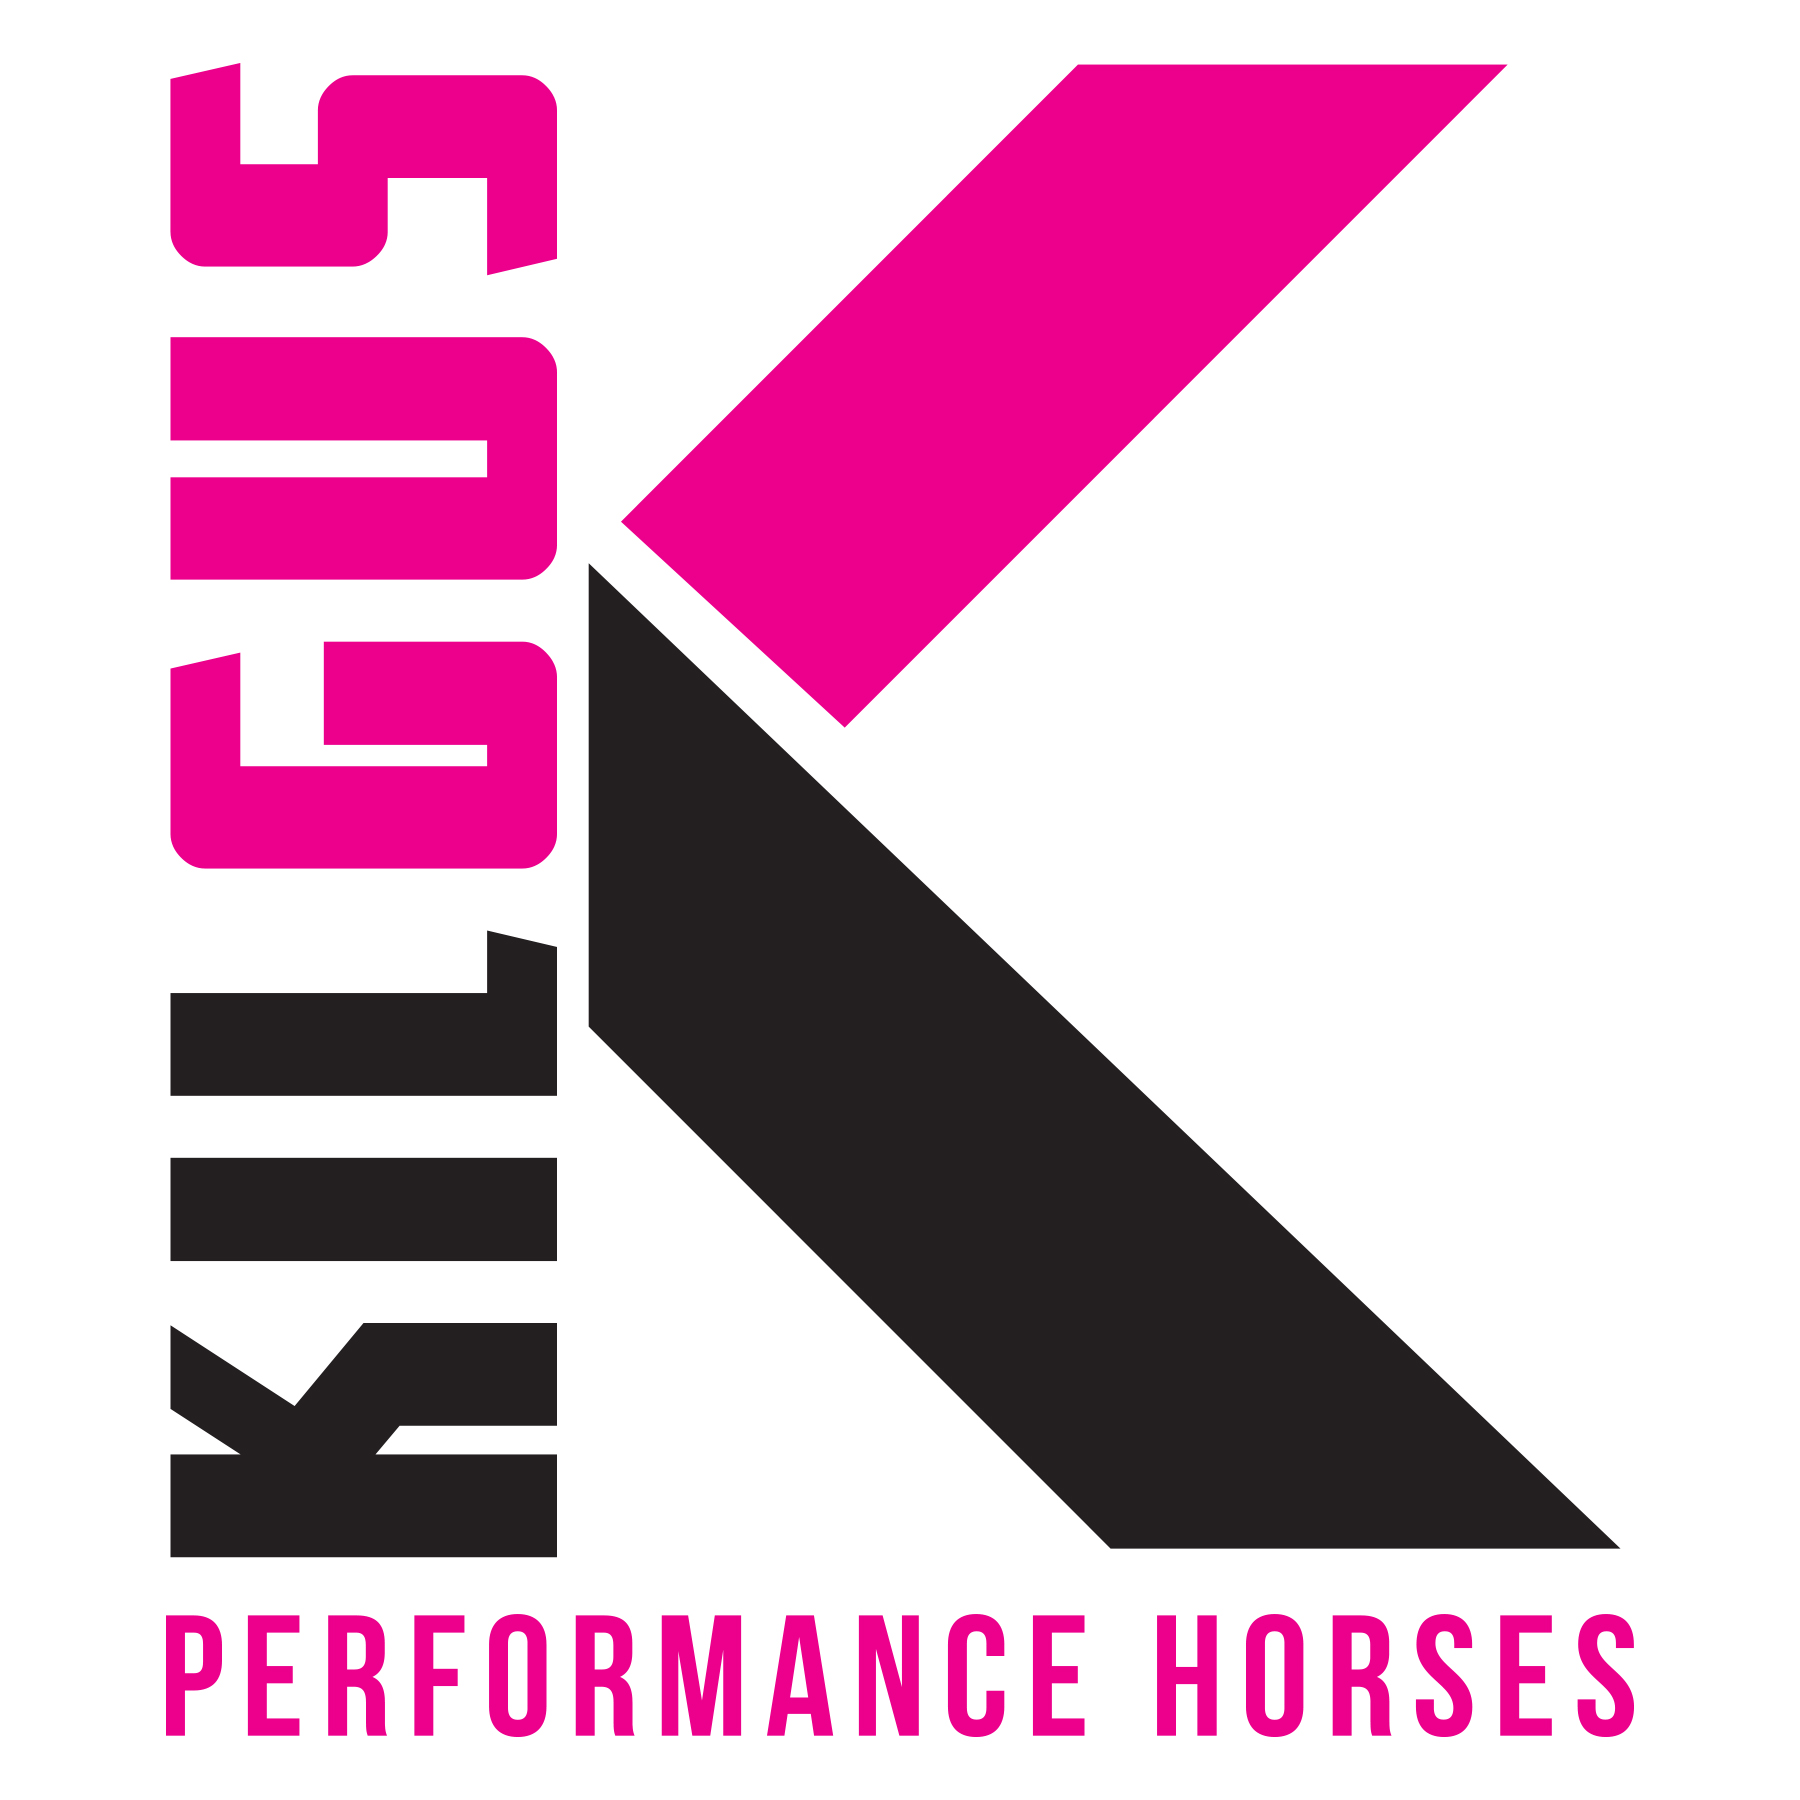 KilgusPerformanceHorses_logo_pink.jpg